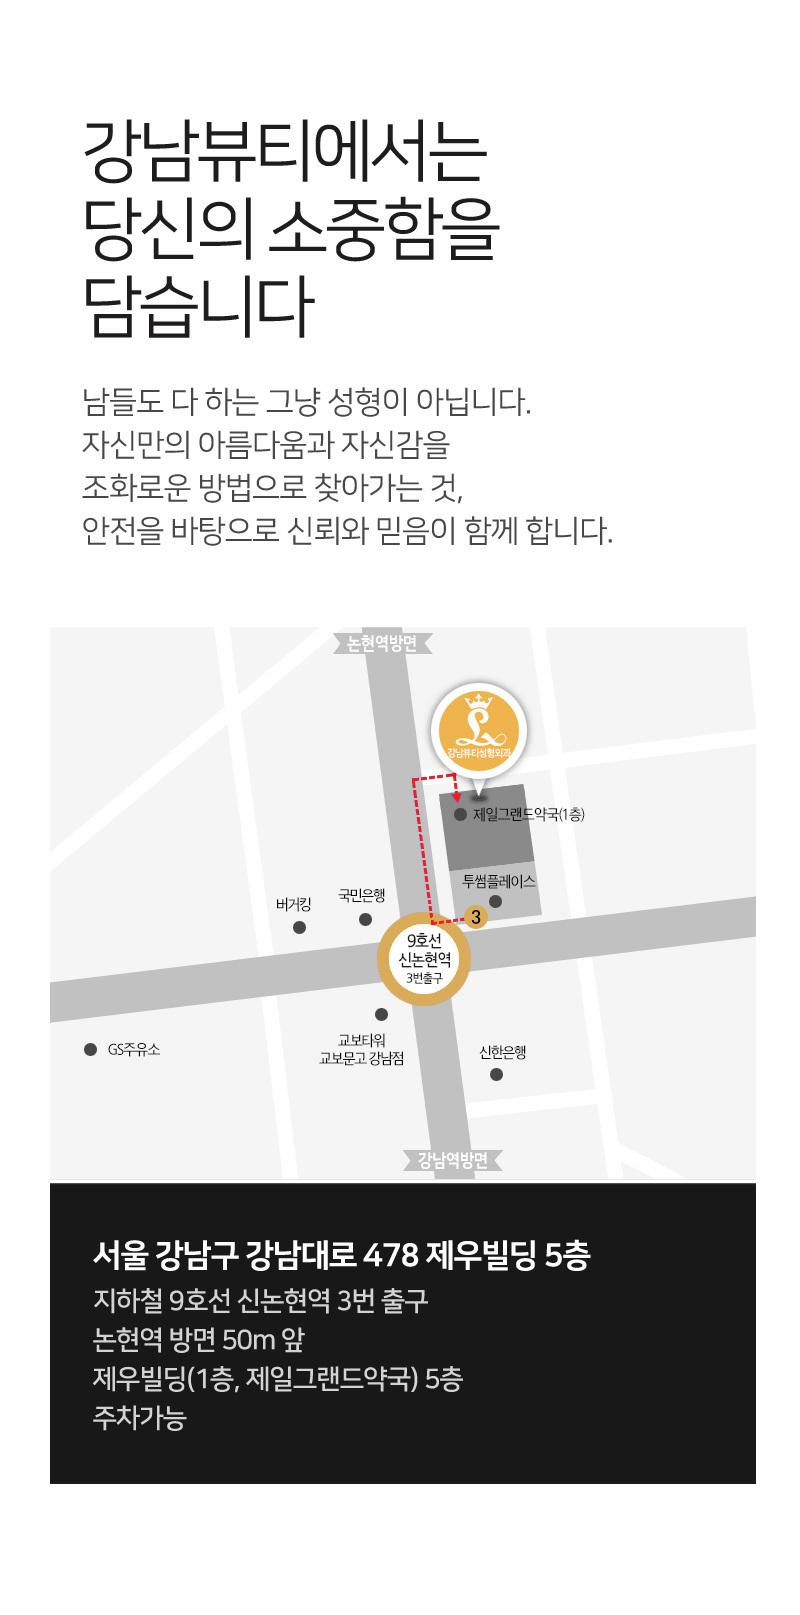 D event info be395cb5c152046fae